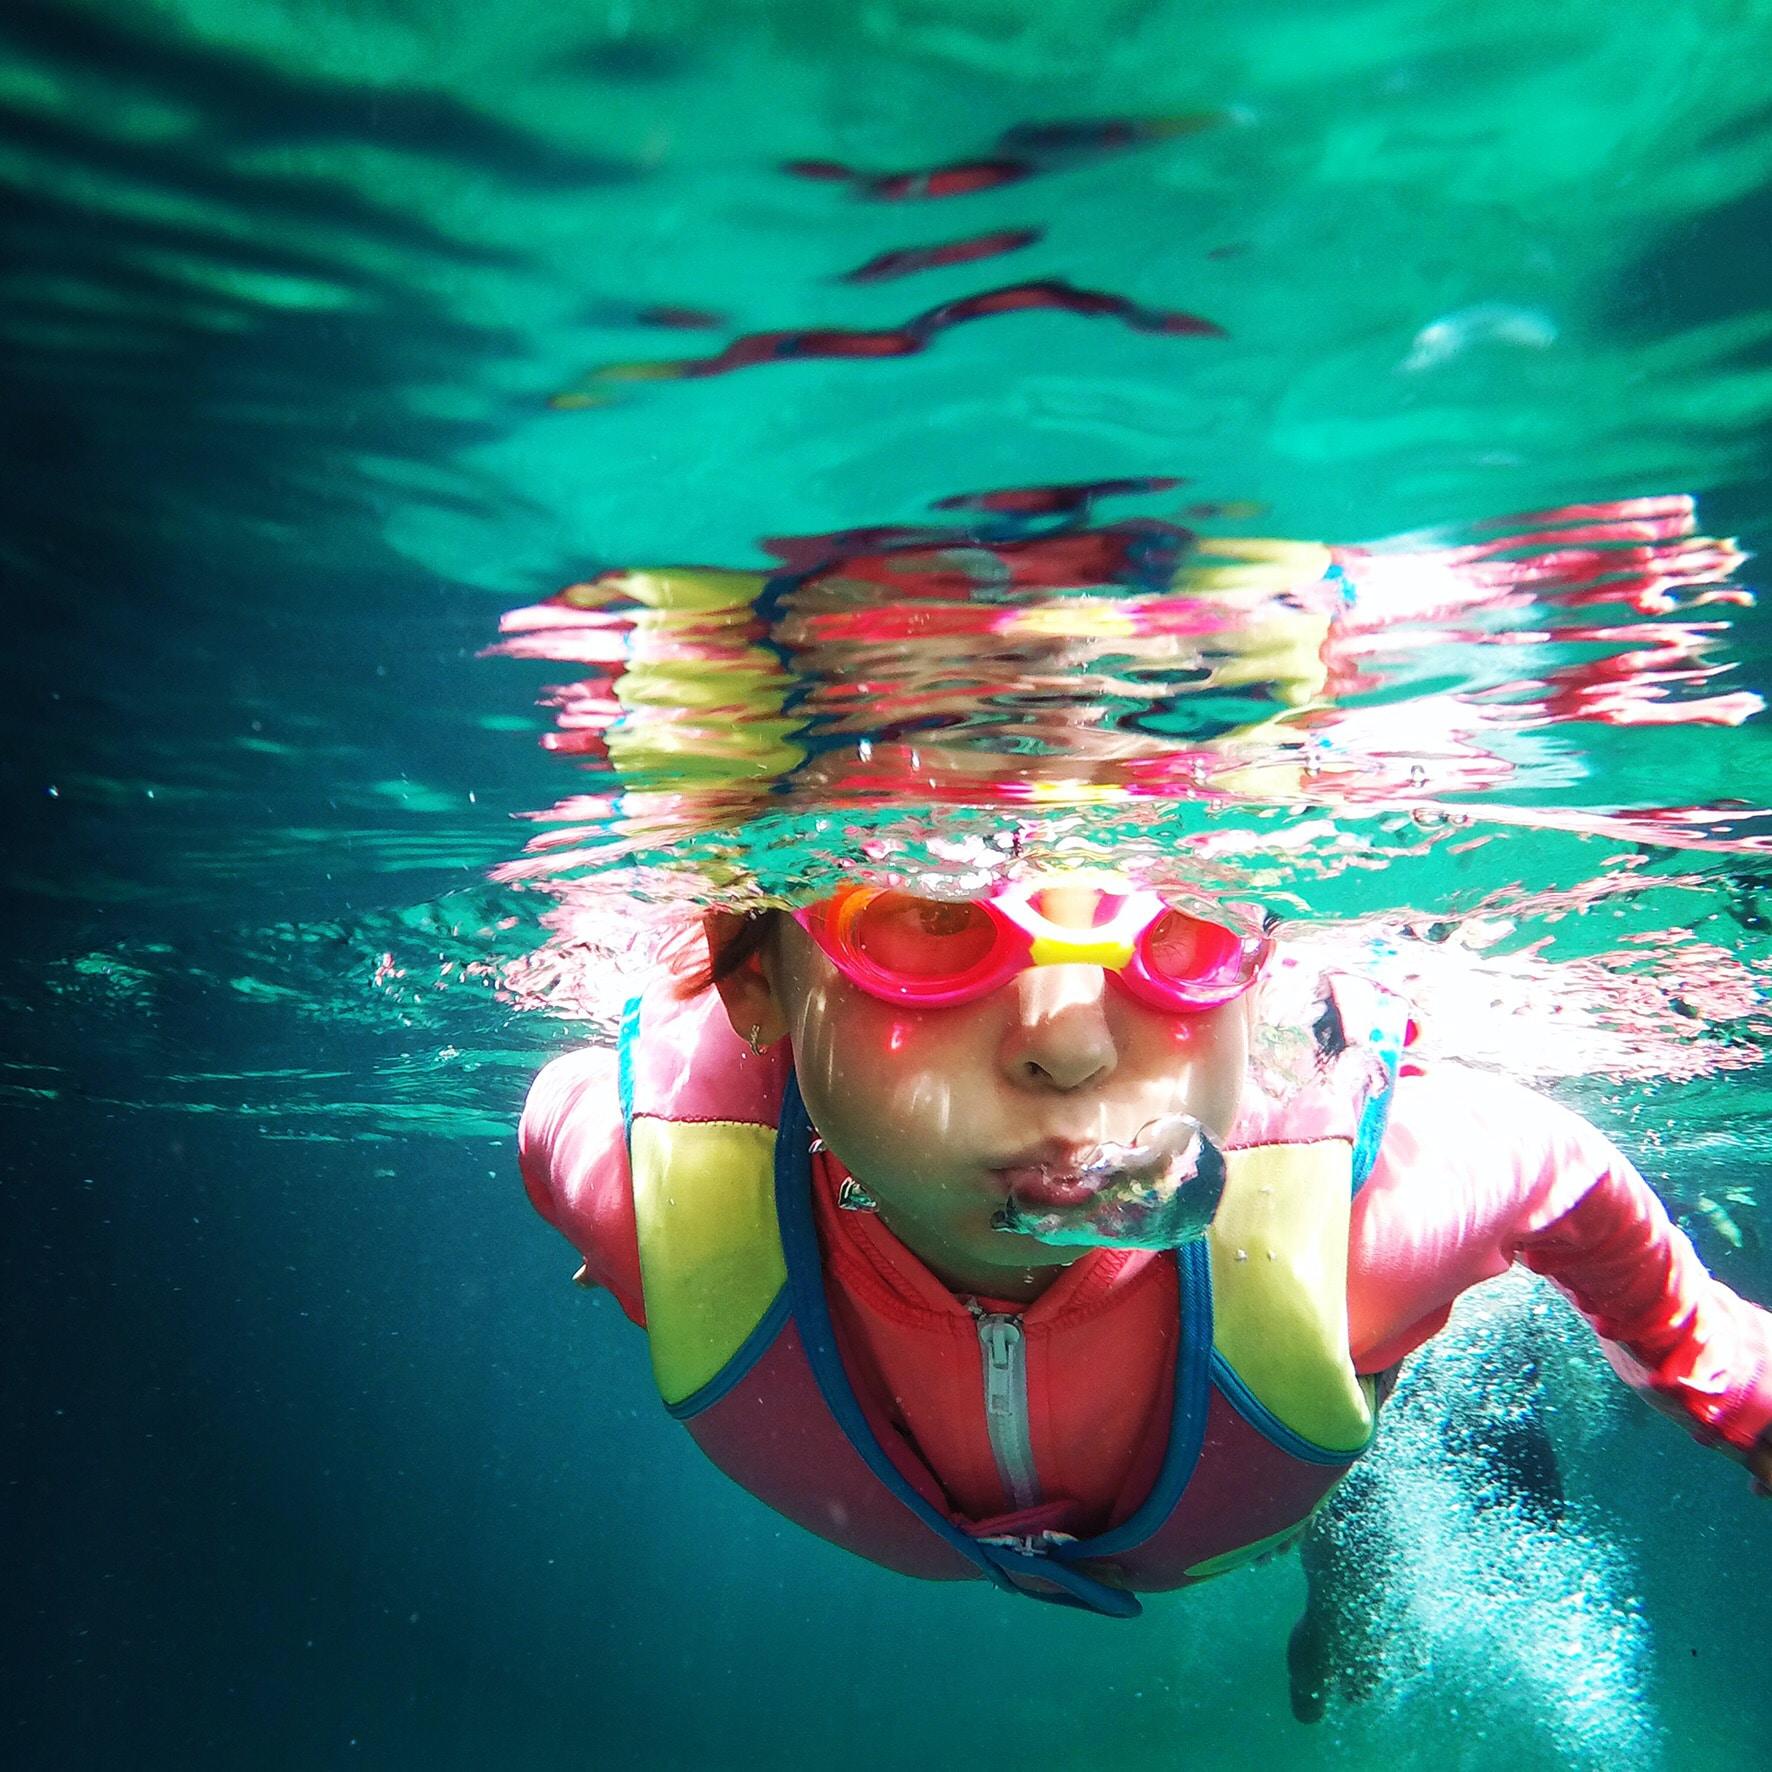 person in pink zip-up jacket swimming under water - home school activity